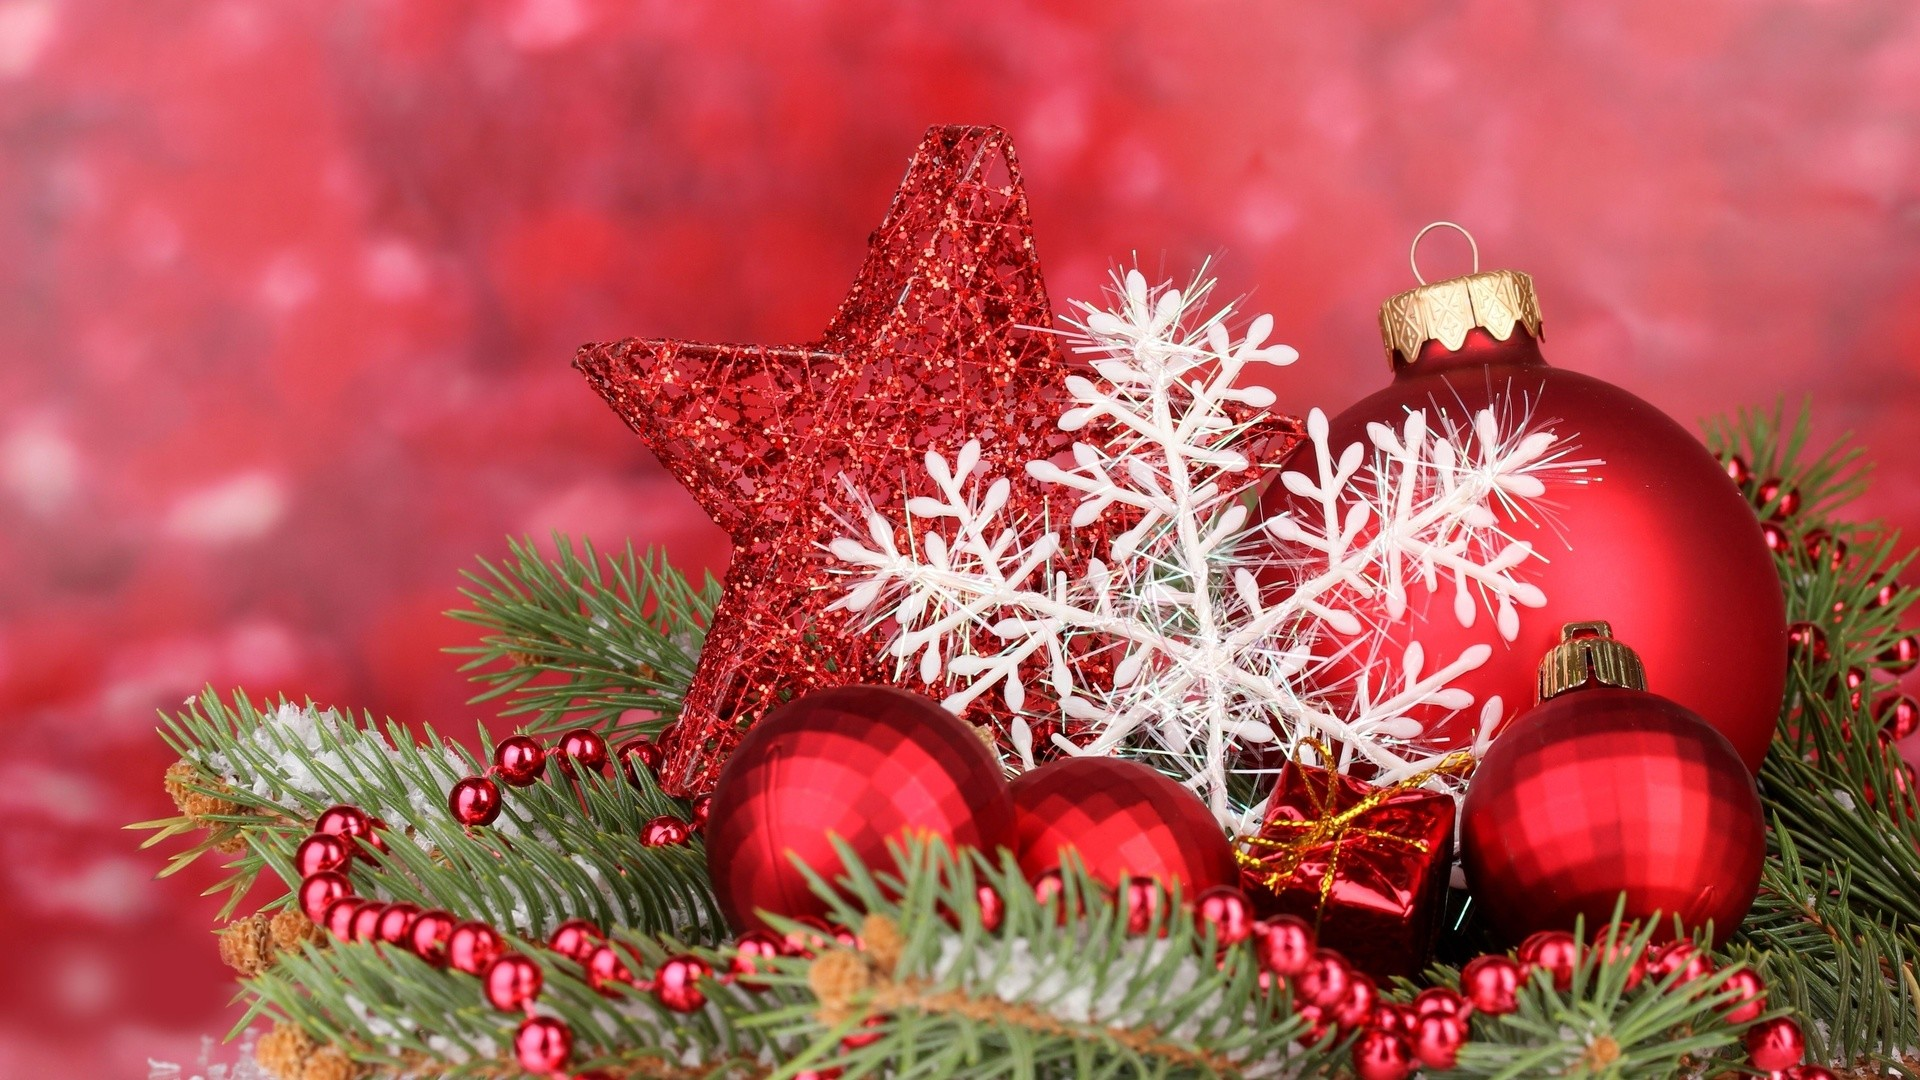 Phenomenal Winter Christmas Desktop Backgrounds 50 Images Home Interior And Landscaping Eliaenasavecom